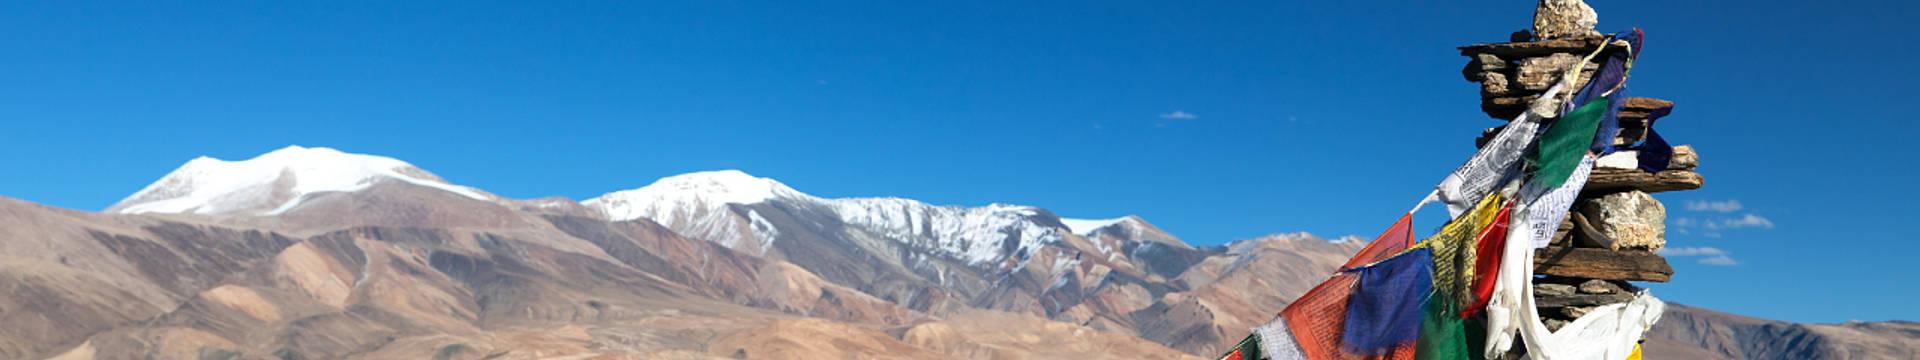 Voyage au Tibet